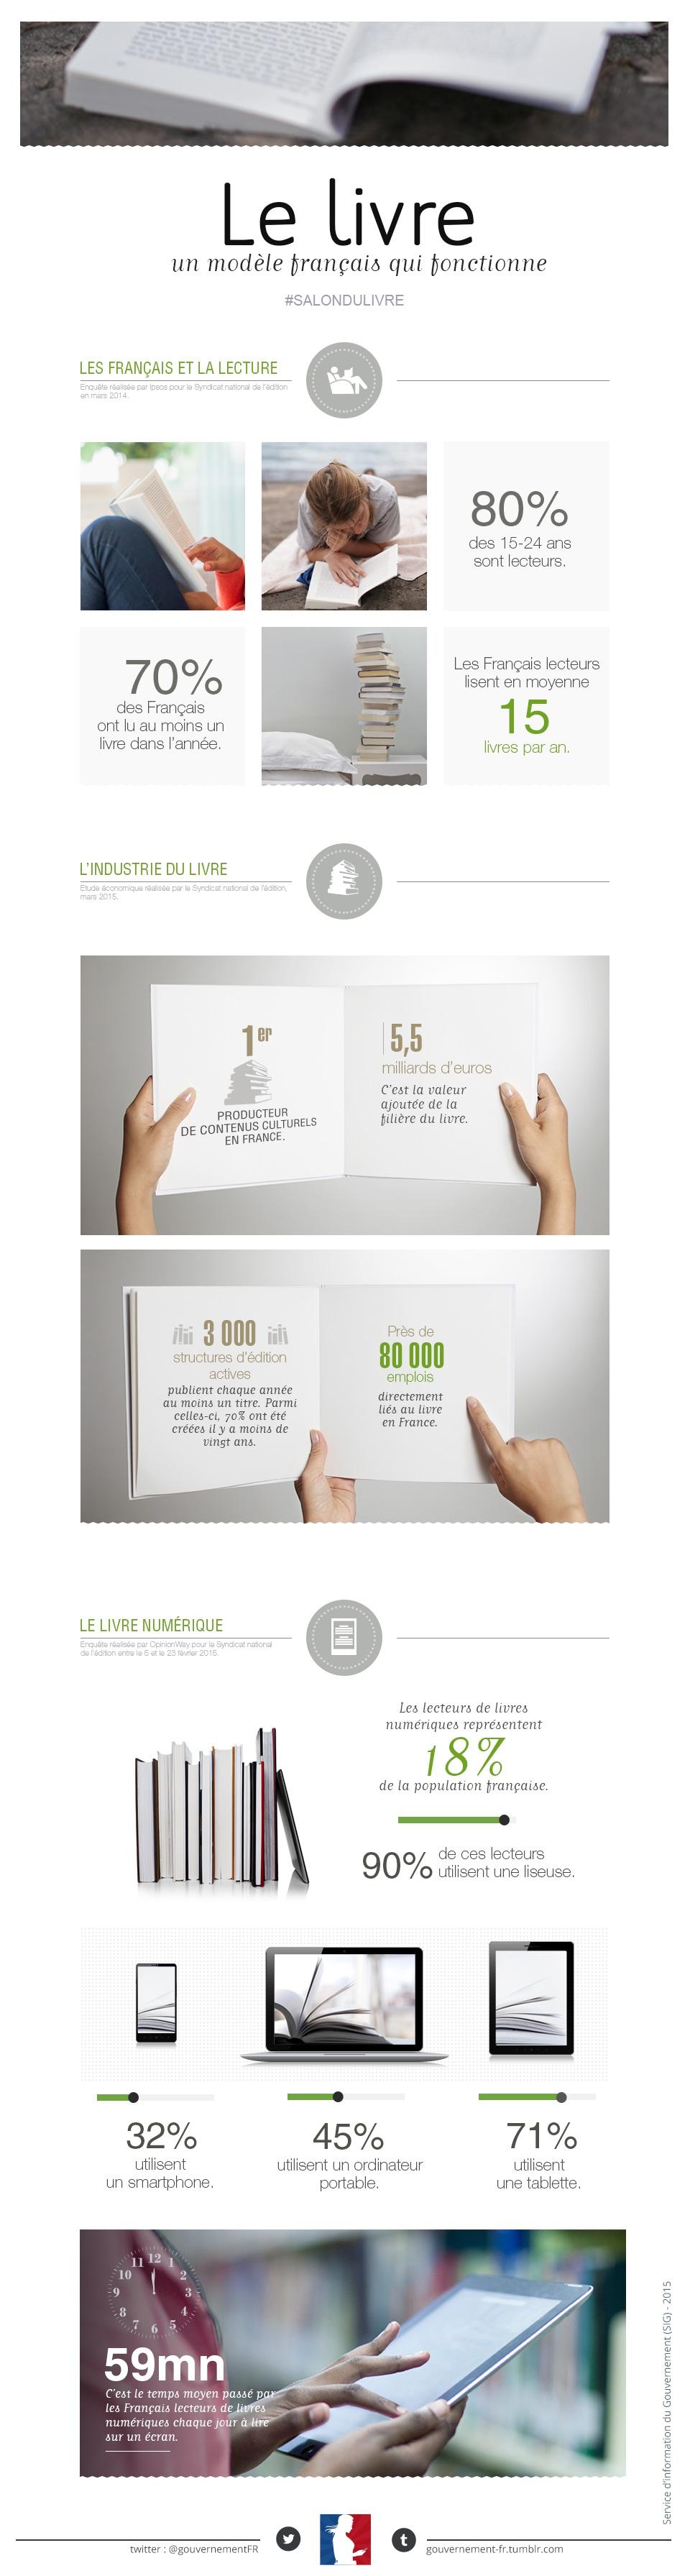 infographie-livre